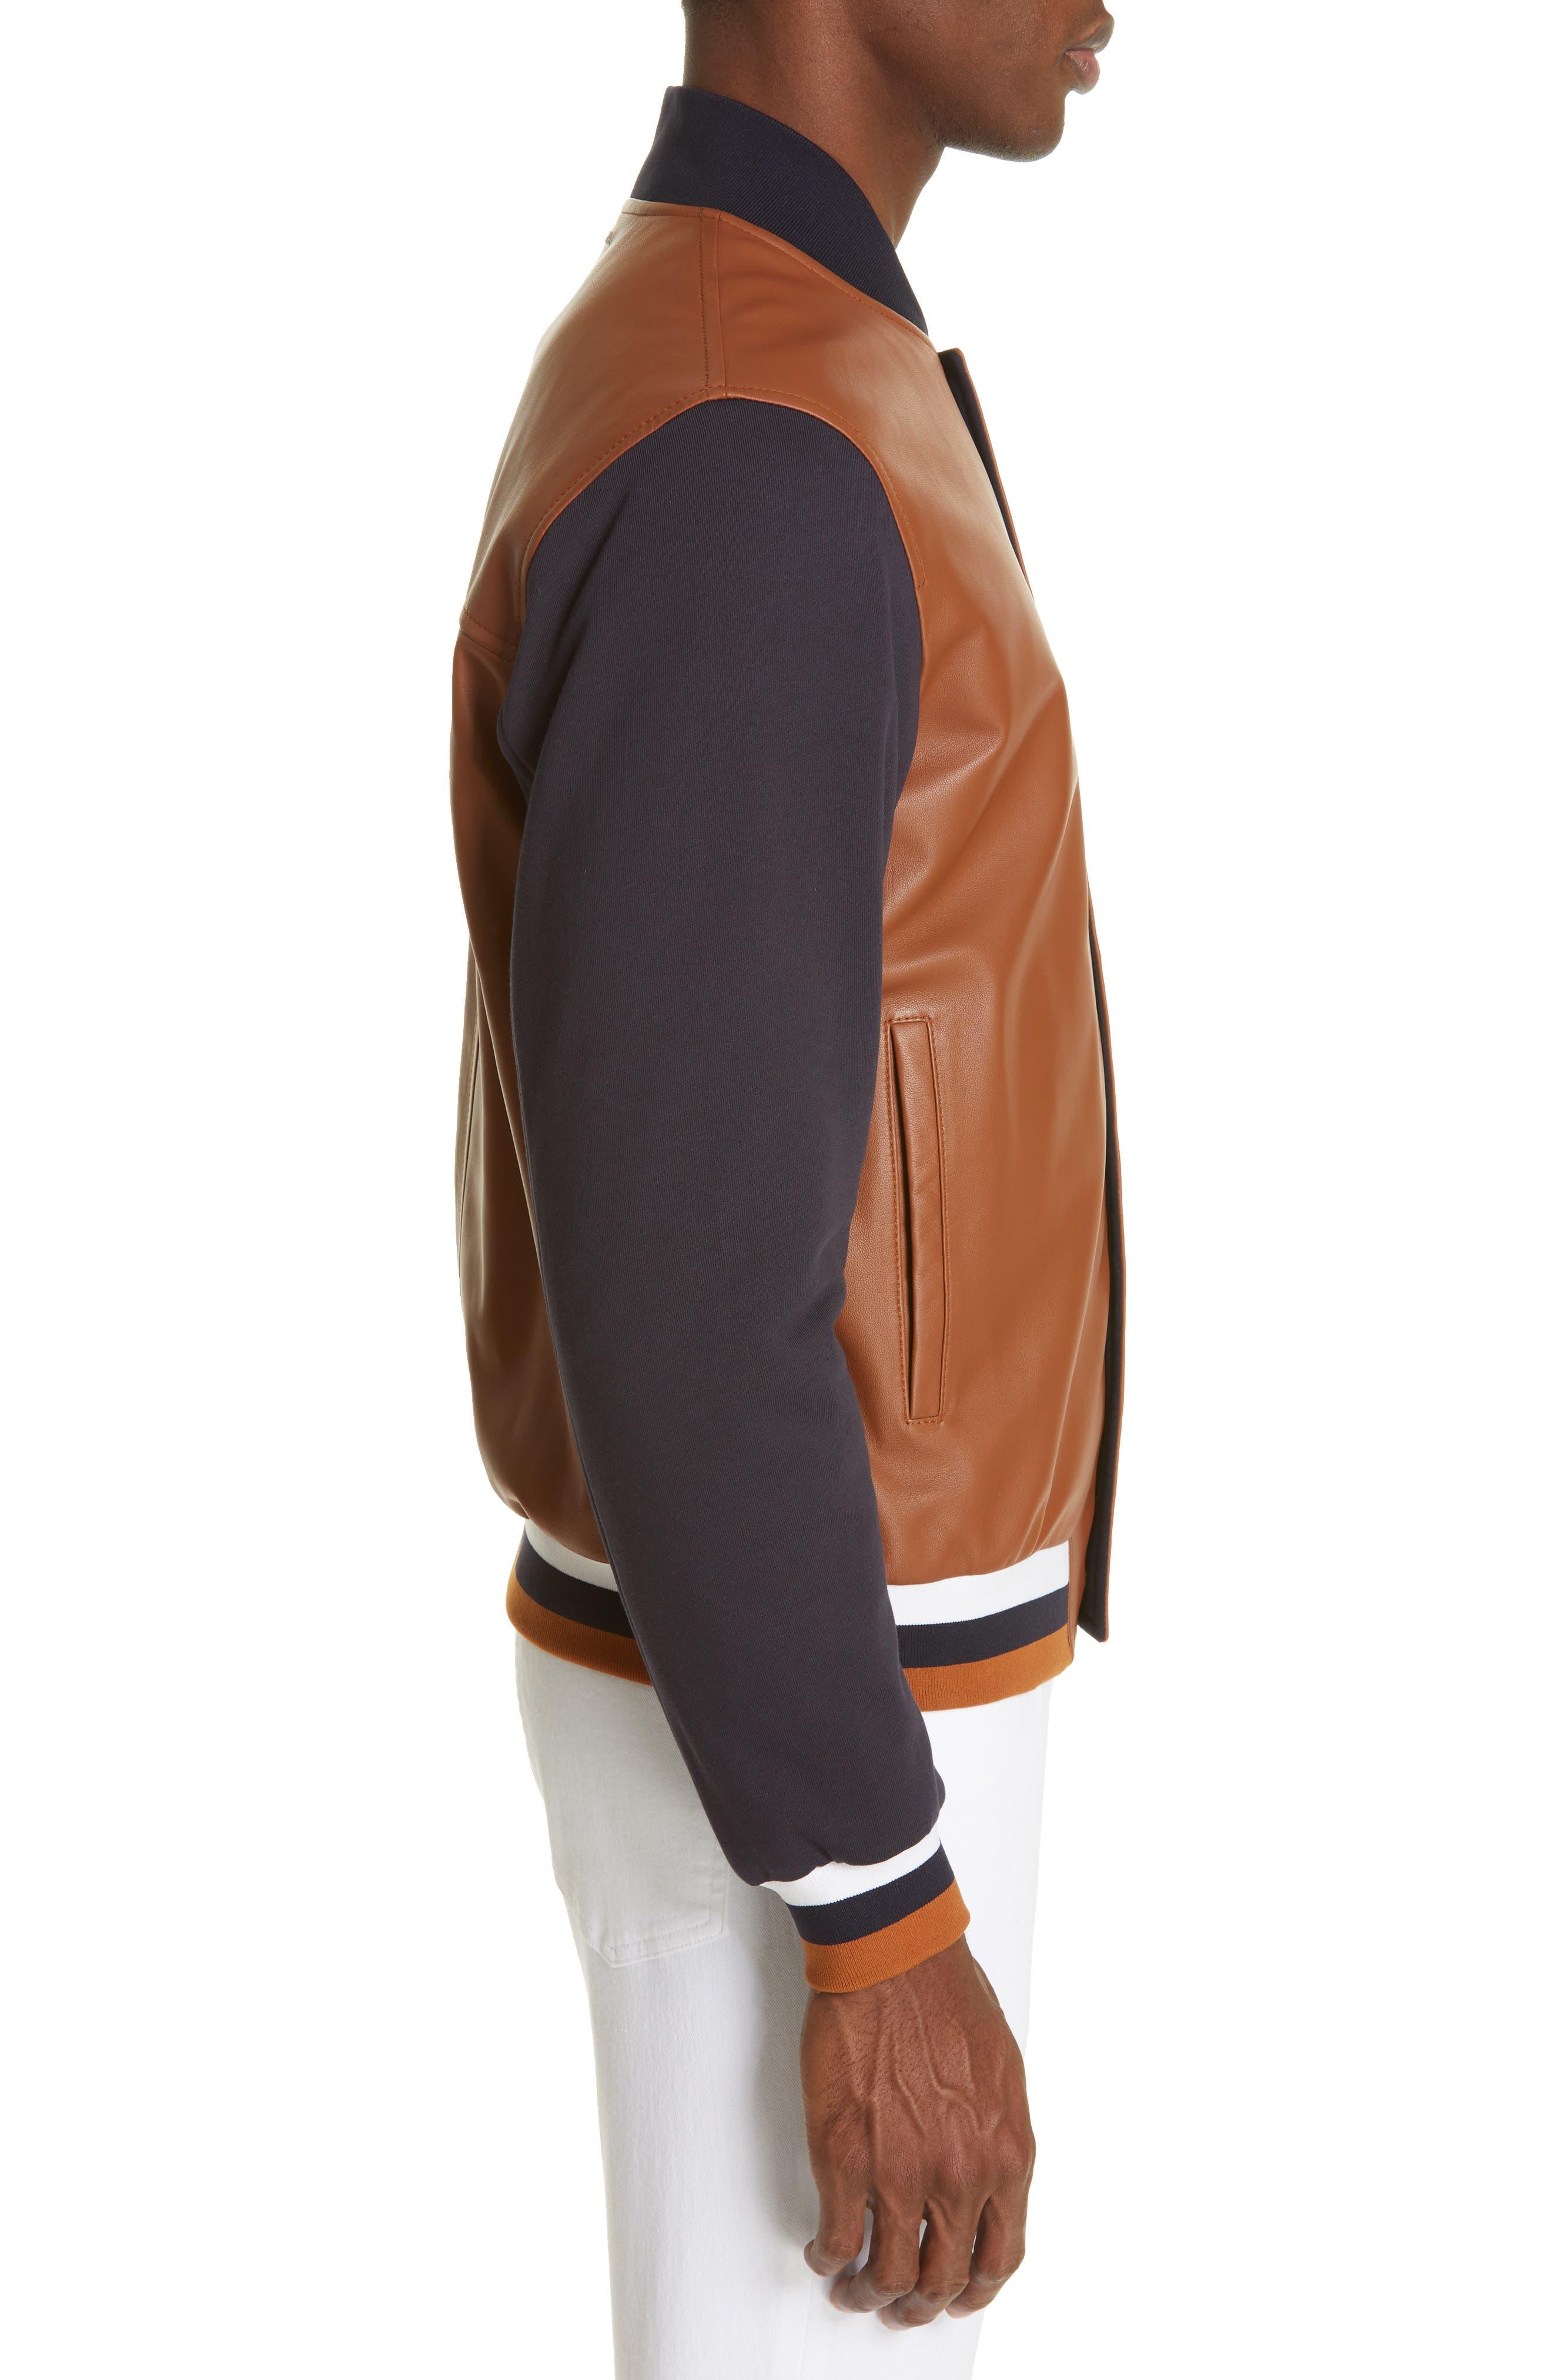 Z ZEGNA, Contrast Leather Bomber Jacket, Alternate thumbnail 3, color, NAVY/ BROWN